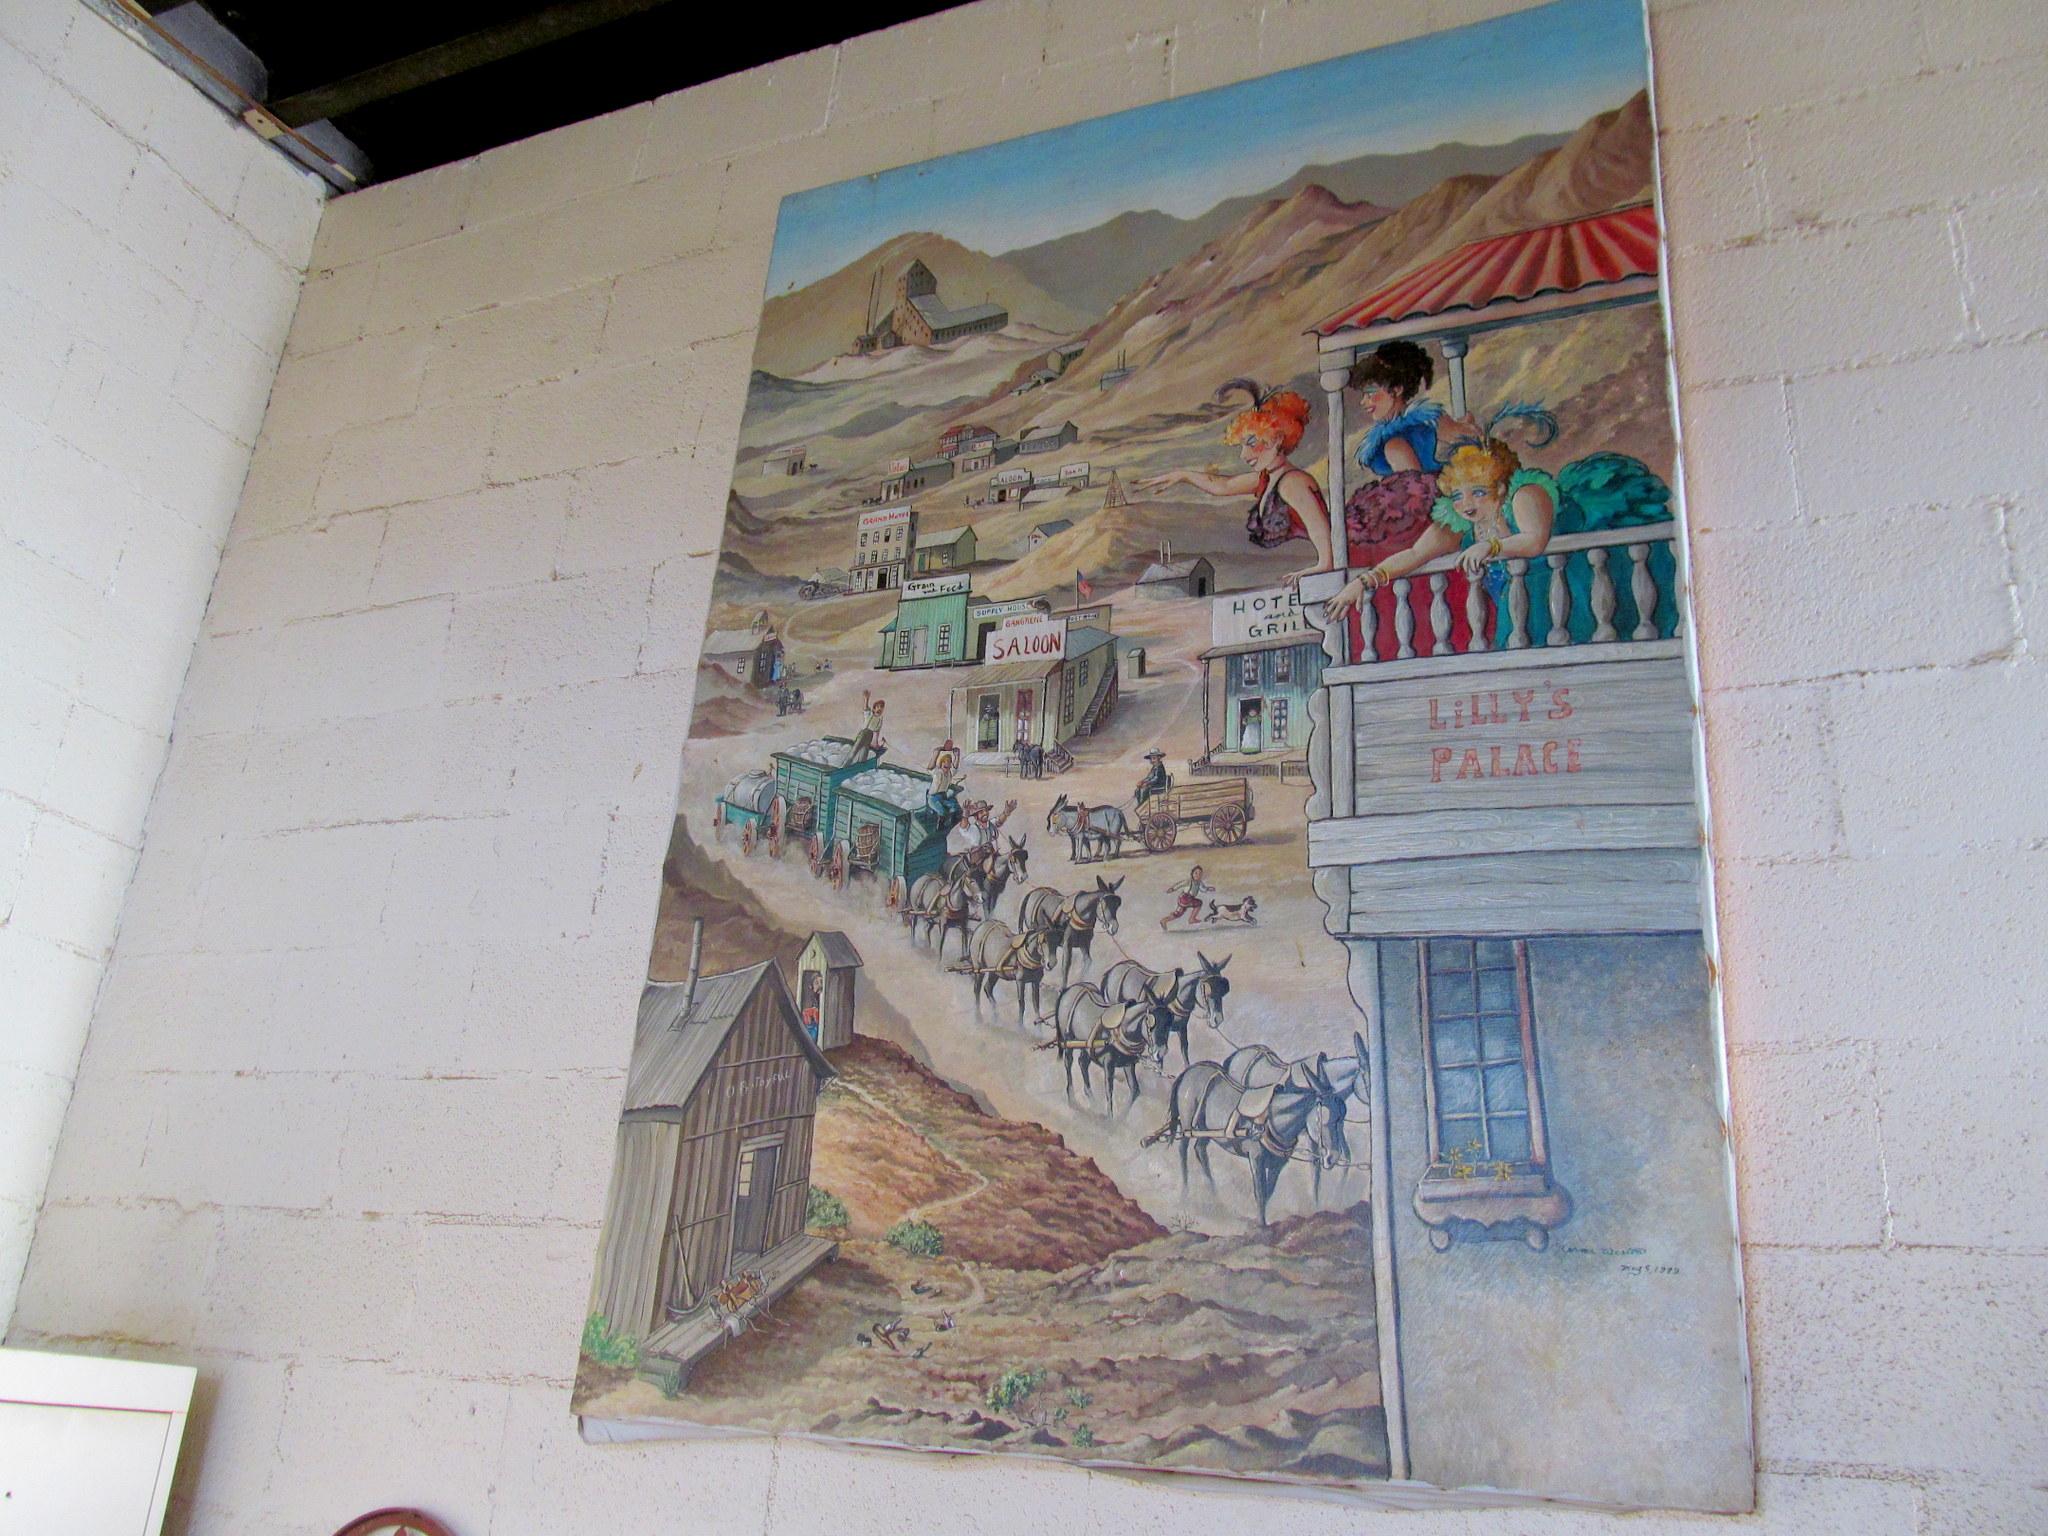 Photo: Painting inside the Ballarat store